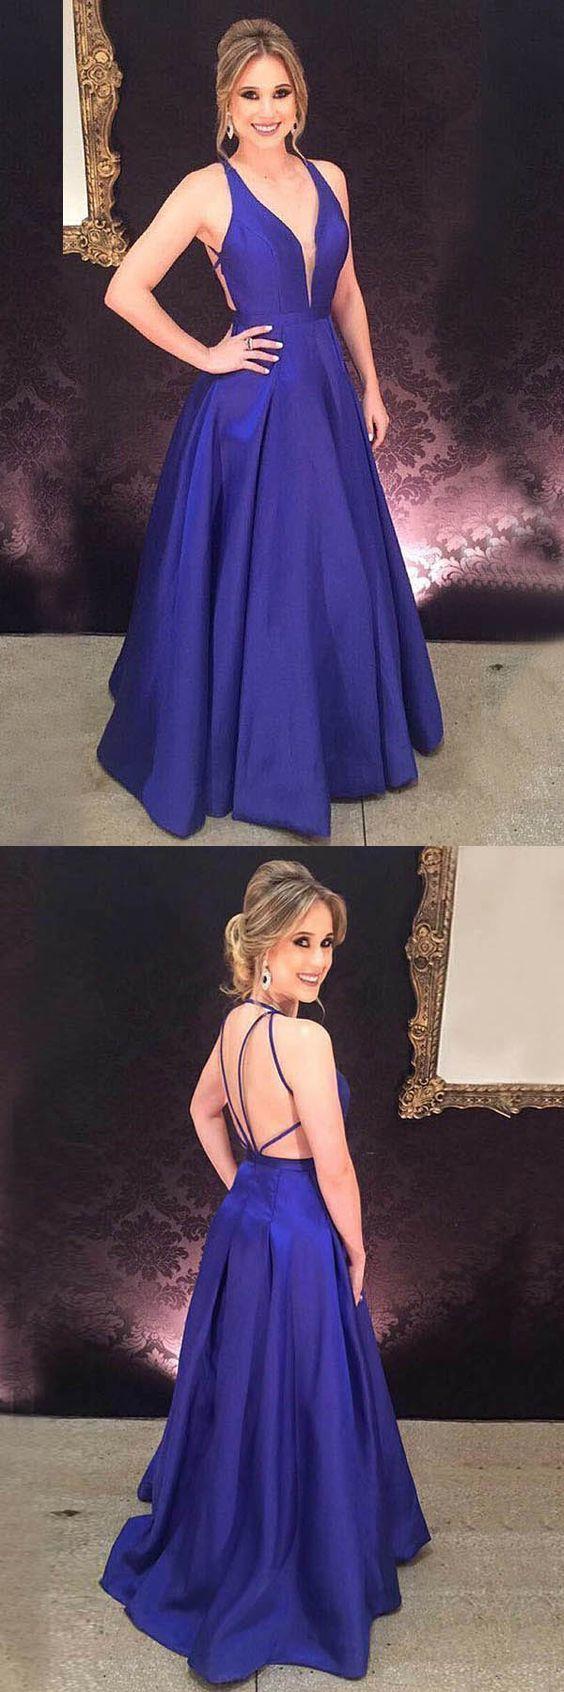 Aline deep vneck royal blue satin pleats prom evening dress